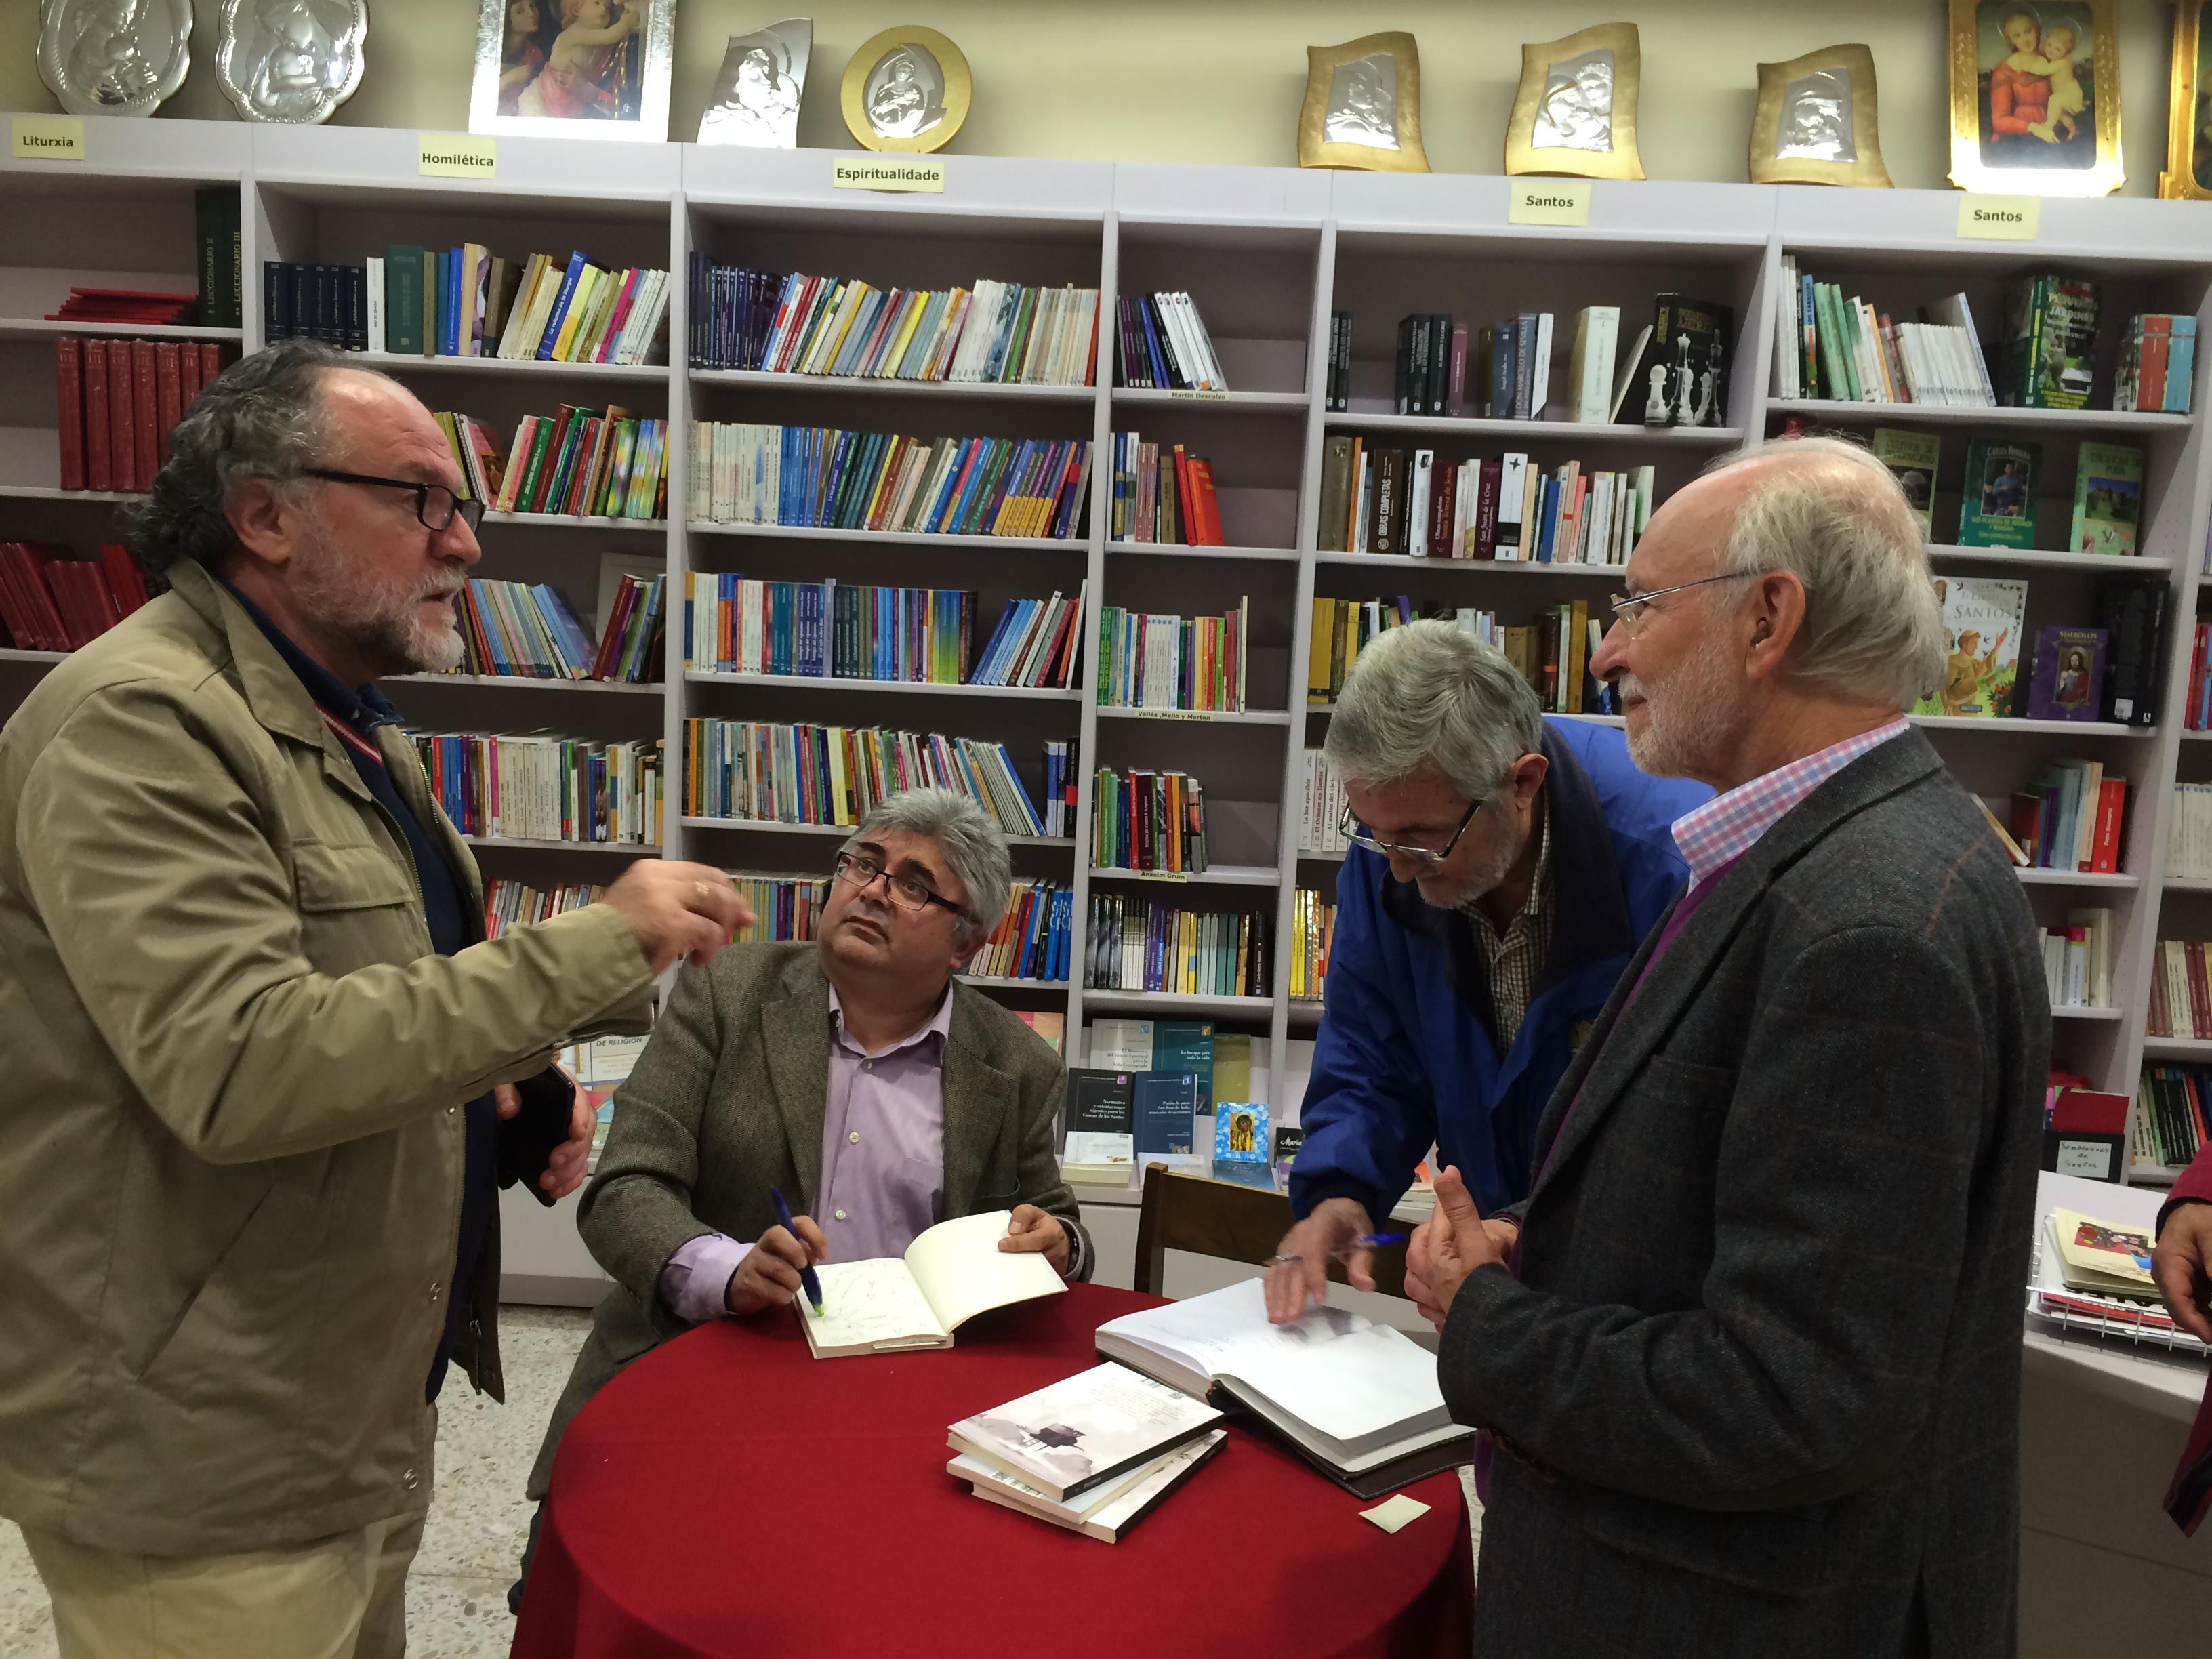 Loureiro, sentado, durante la firma de libros a sus amigos FOTOS: J.M.G.